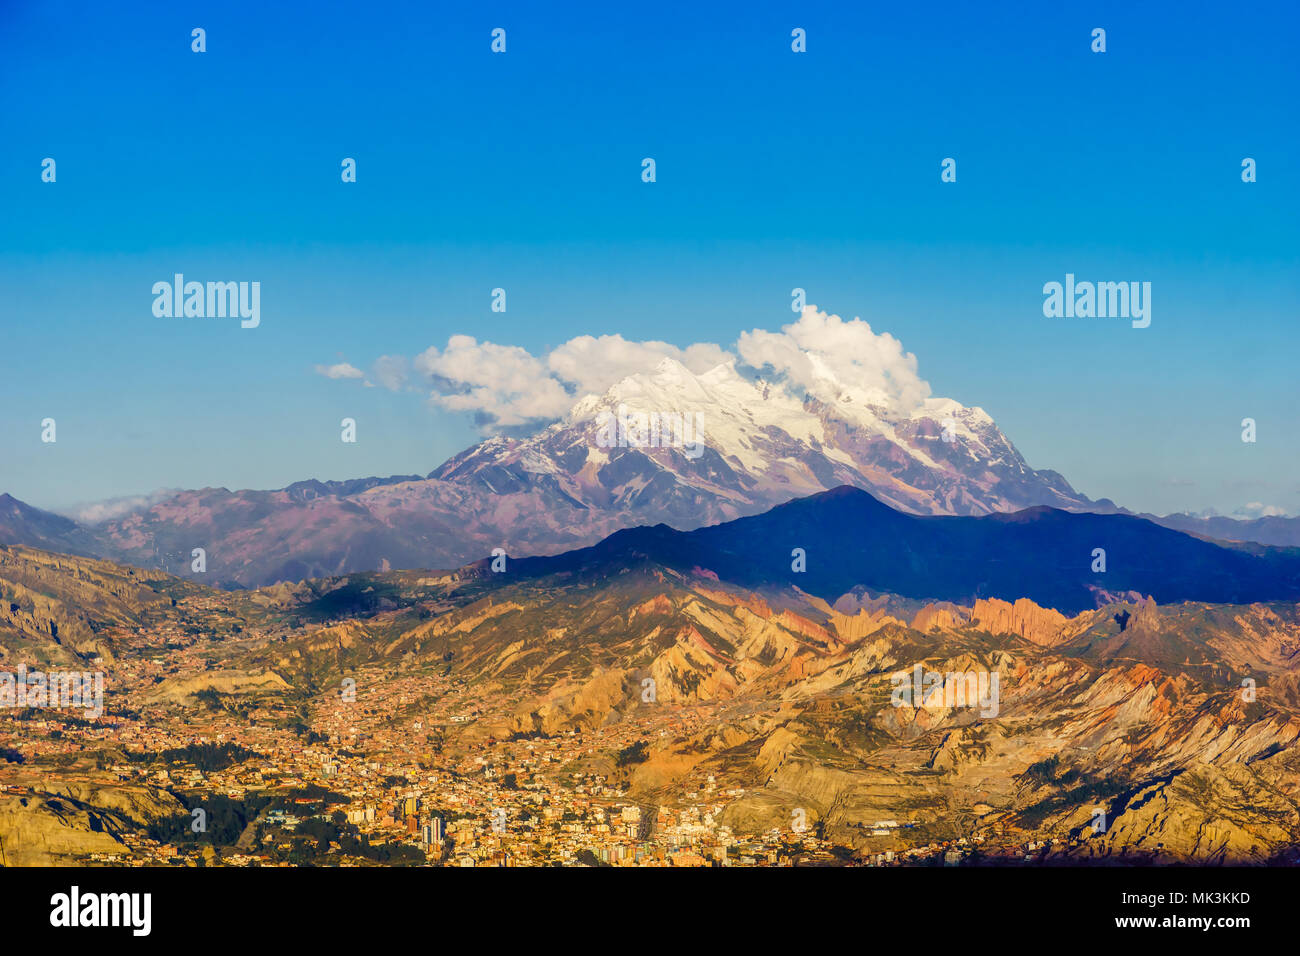 View on cityscape of La Paz with illimani mountain - Bolivia - Stock Image